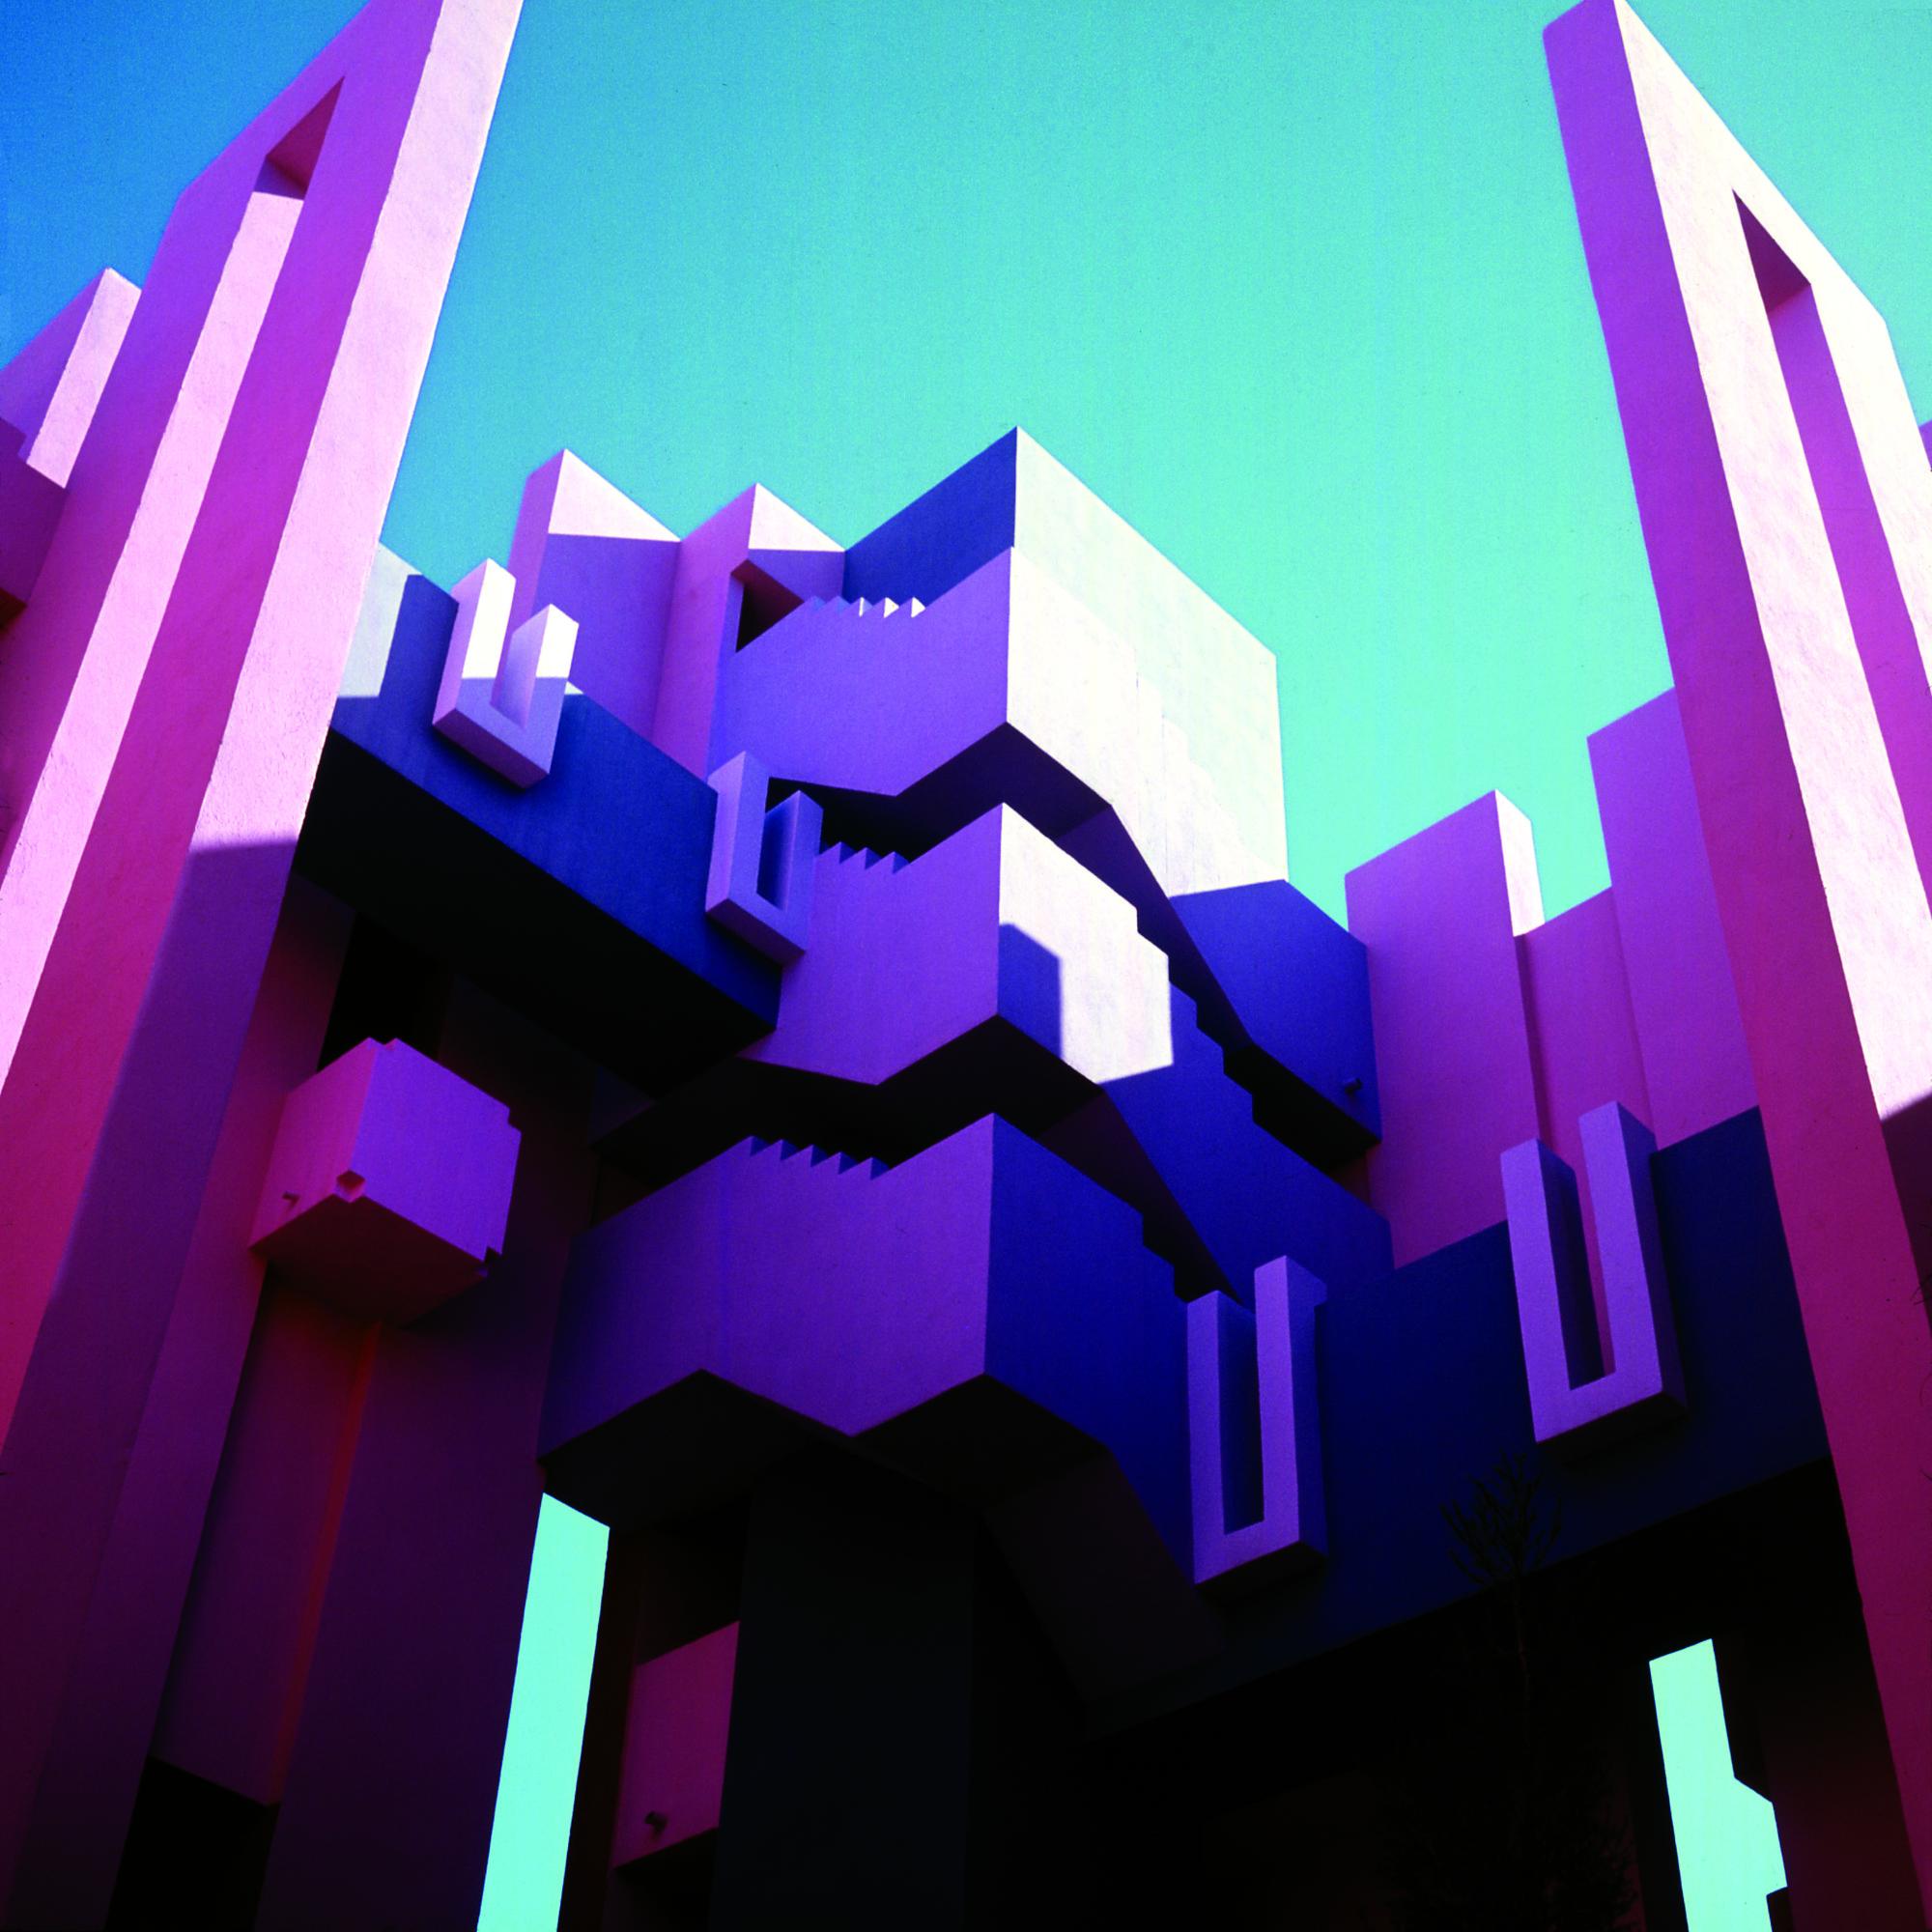 Ricardo_Bofill_Taller_de_Arquitectura_La_Muralla_Roja_Calpe_Spain